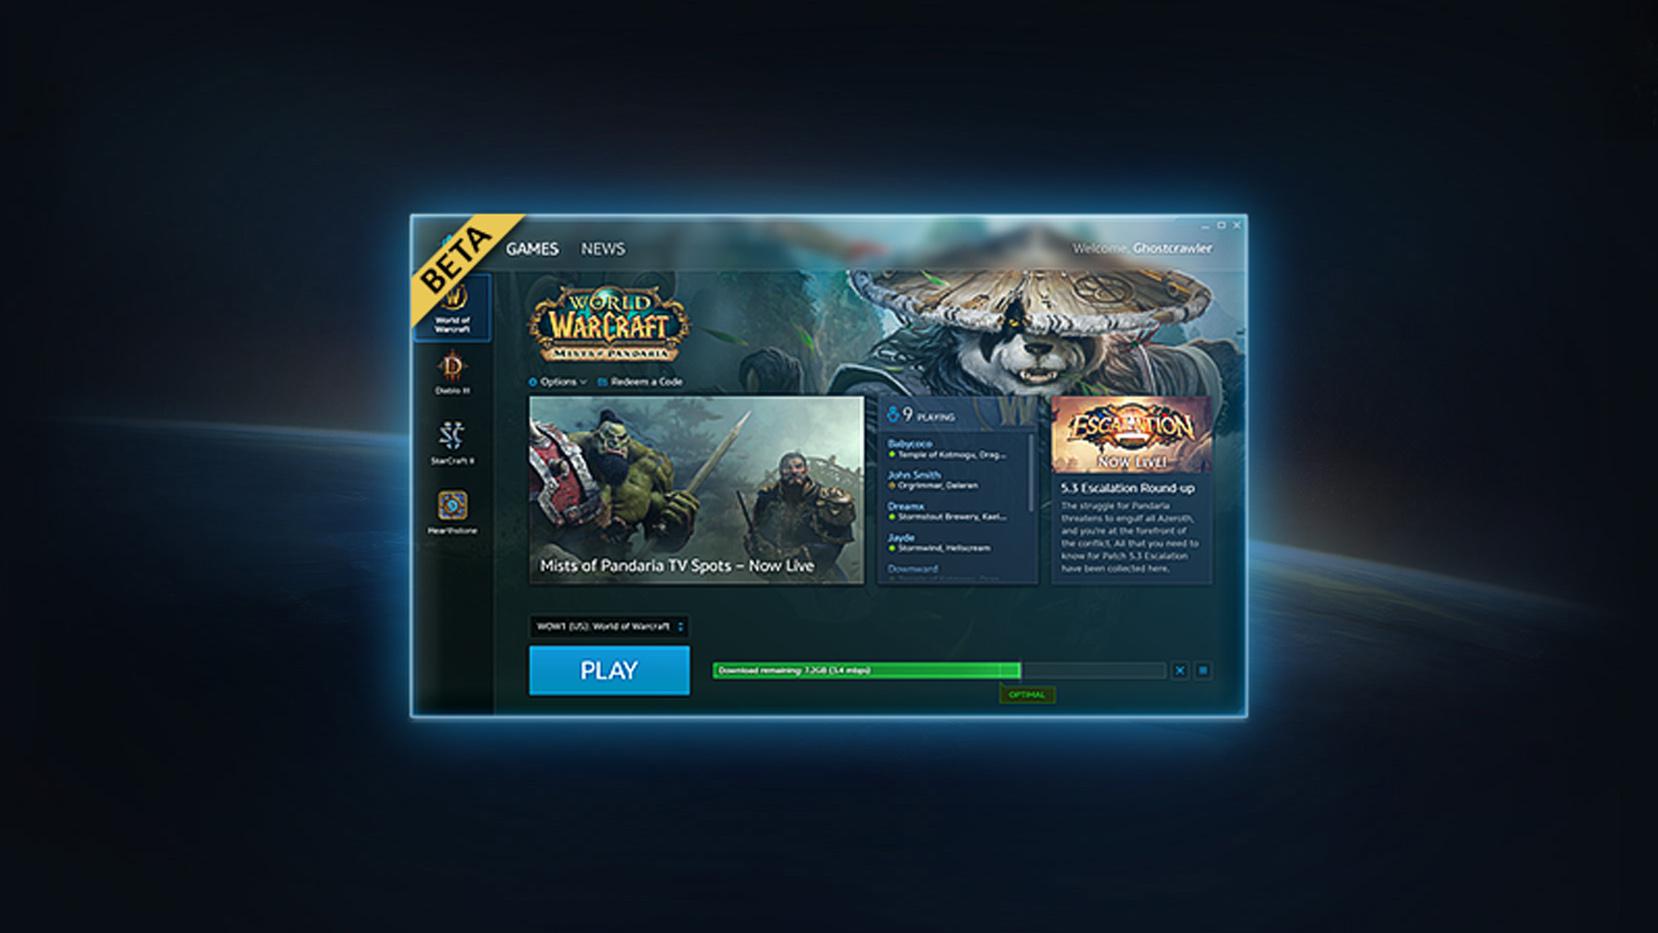 Battle.net desktop app out now